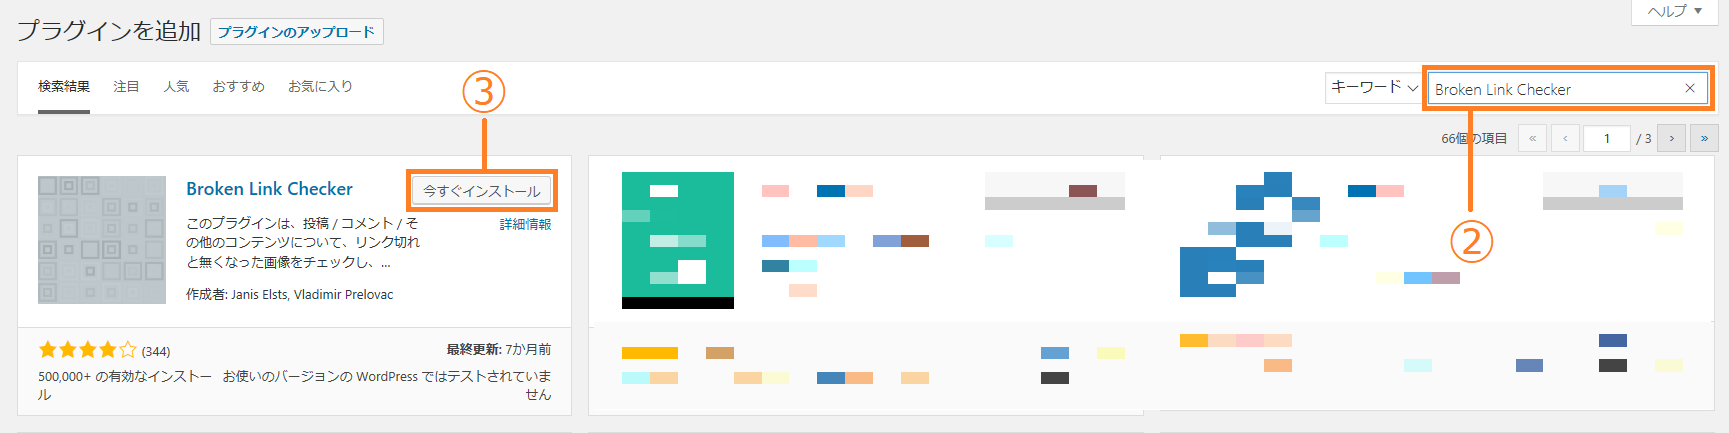 broken-link-checker-setting_02